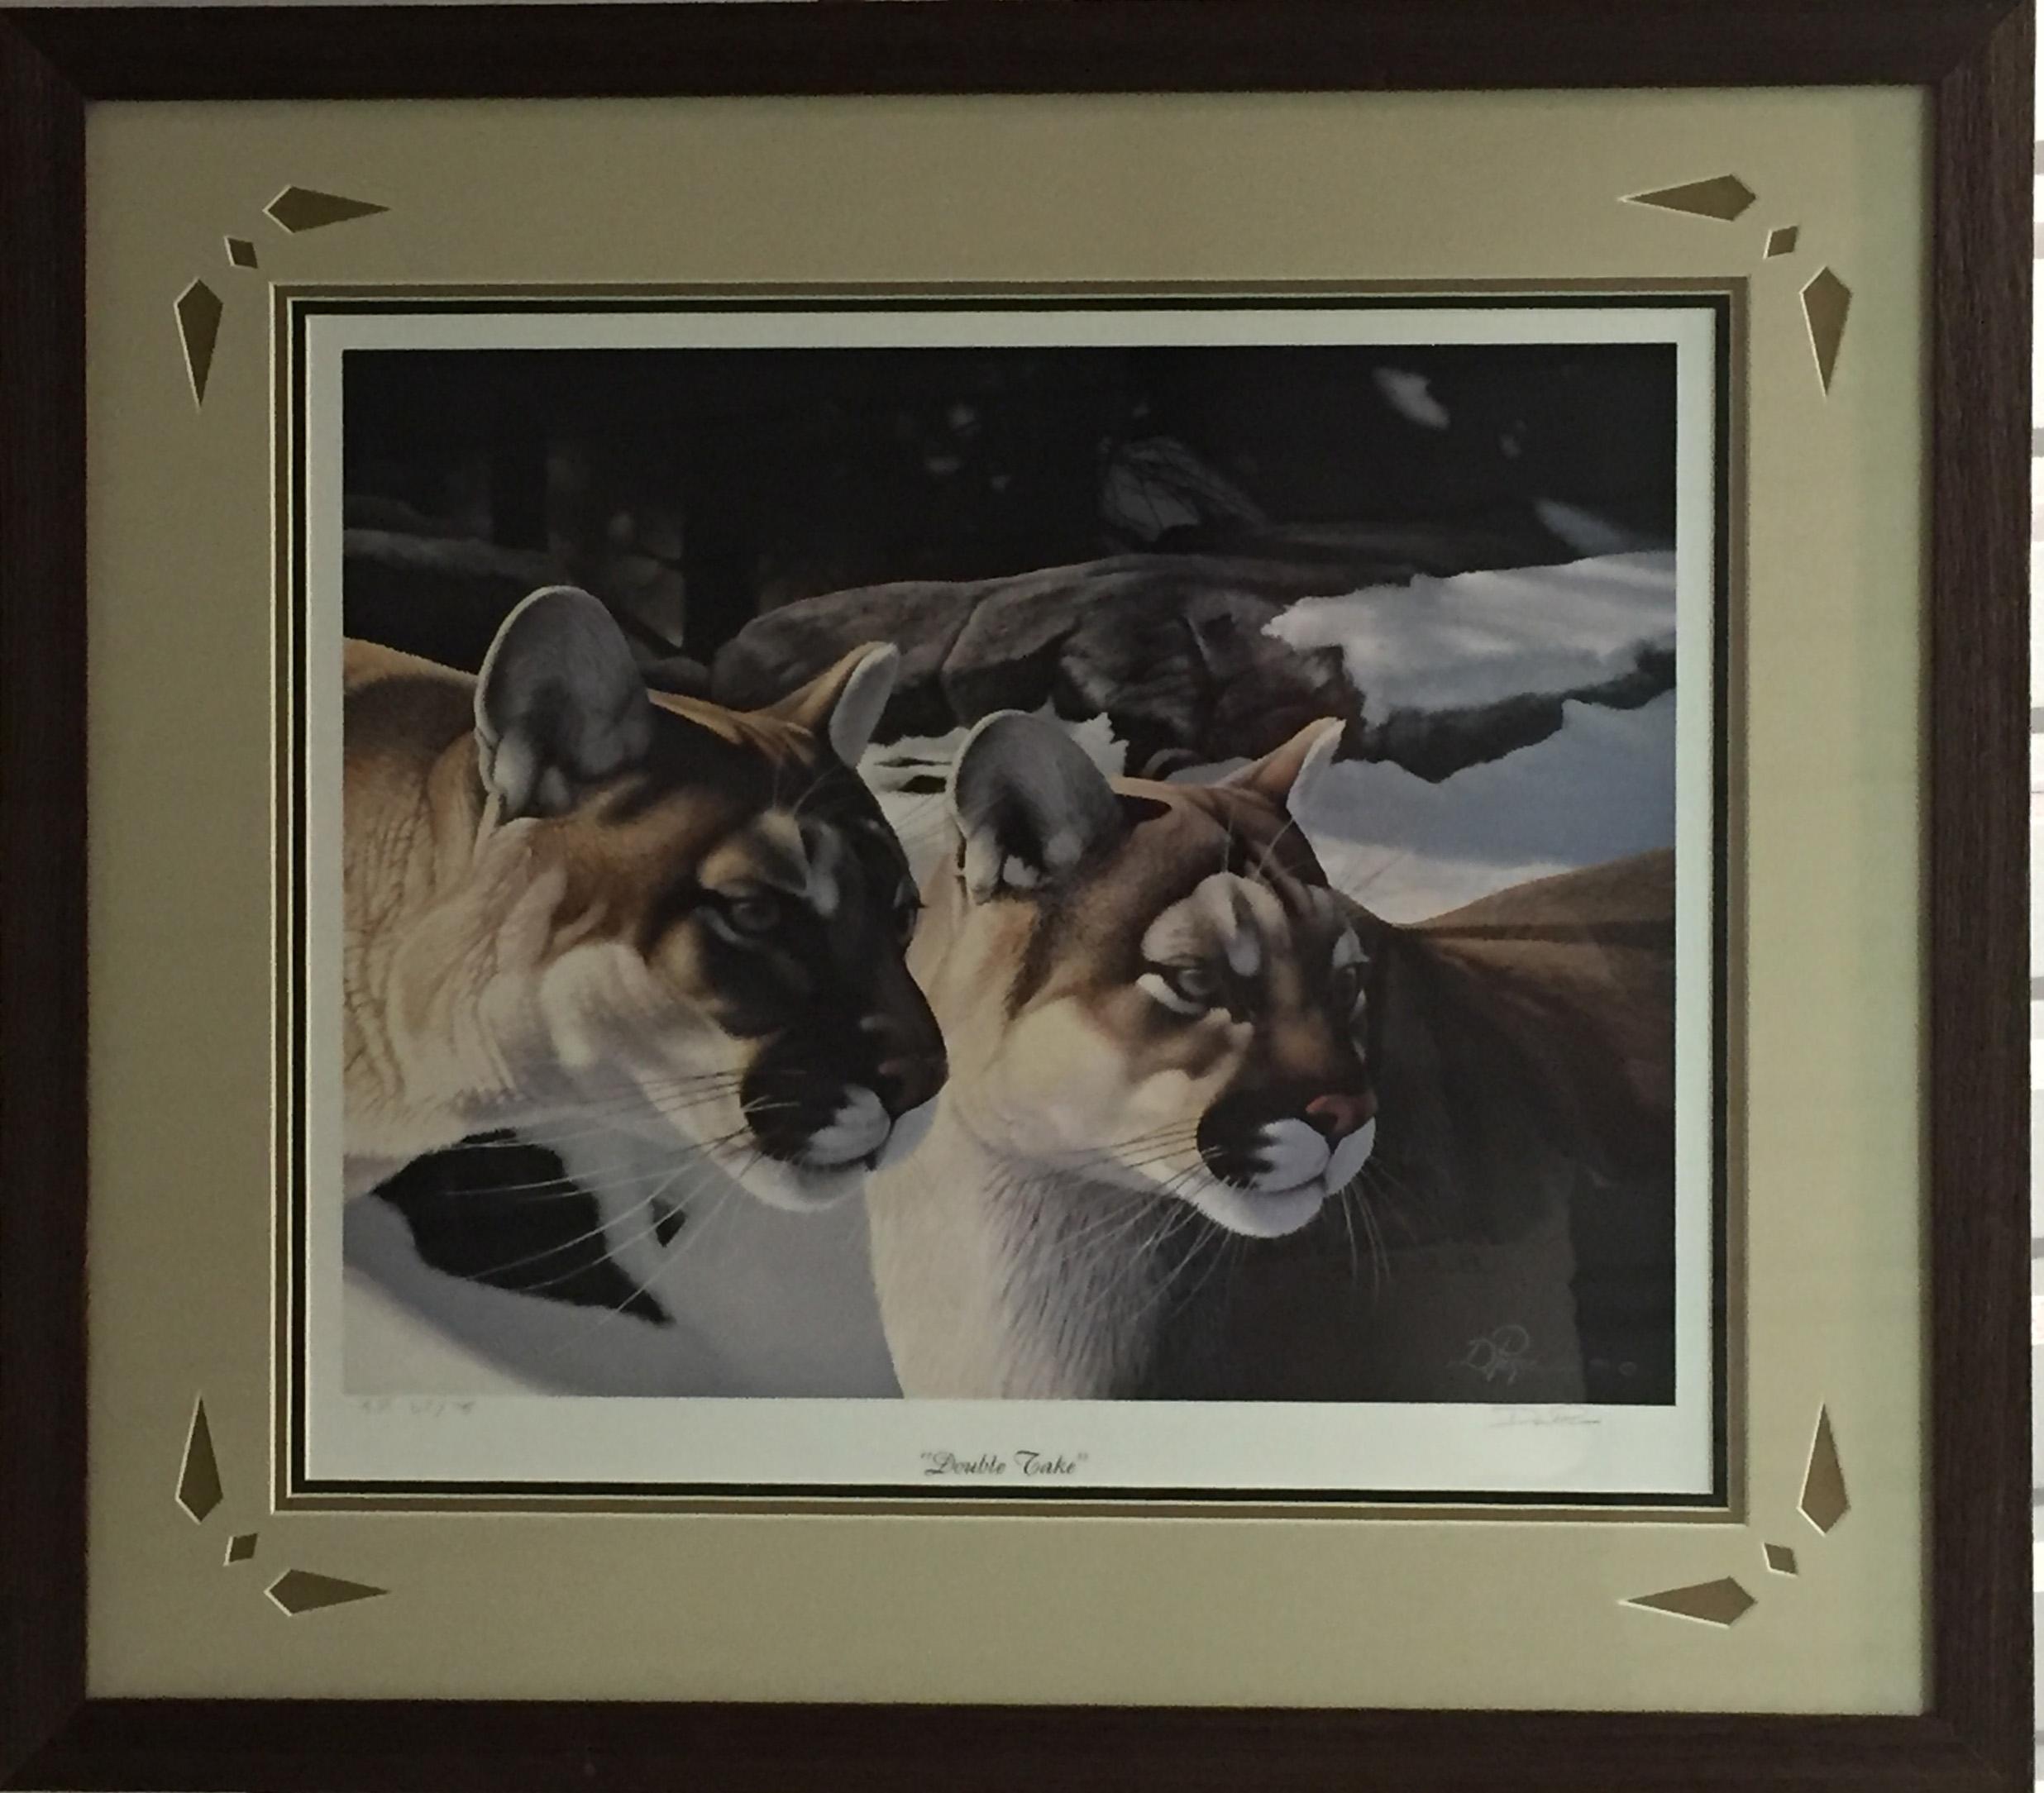 Pierce - Double Take framed